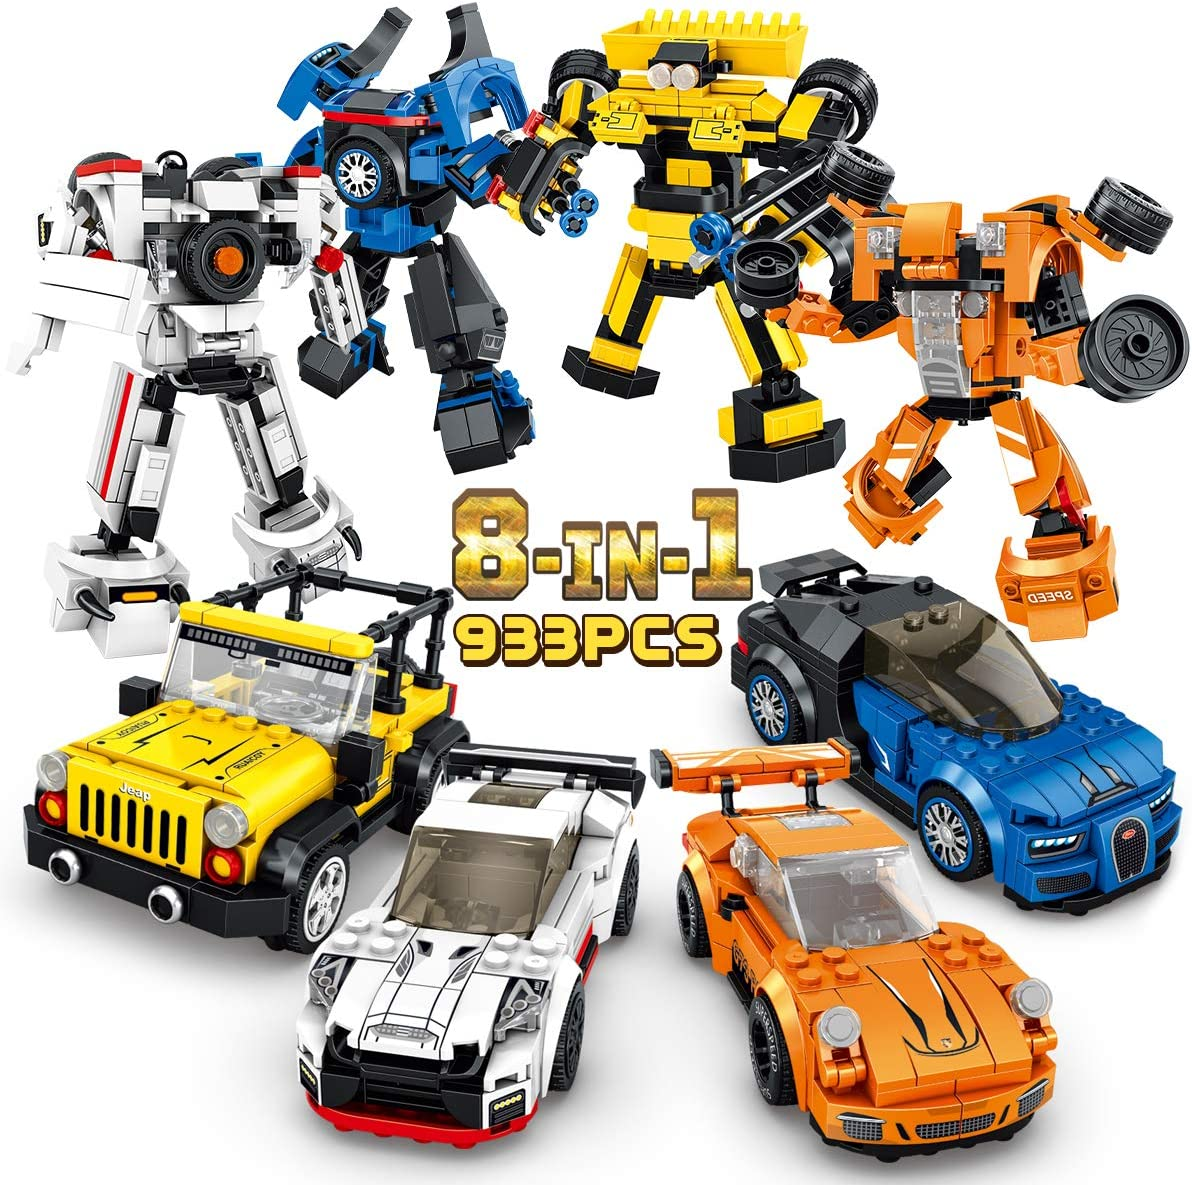 Panlos STEM Robot Educational Learning Building Bricks Ranking Charlotte Mall TOP12 Model Toy